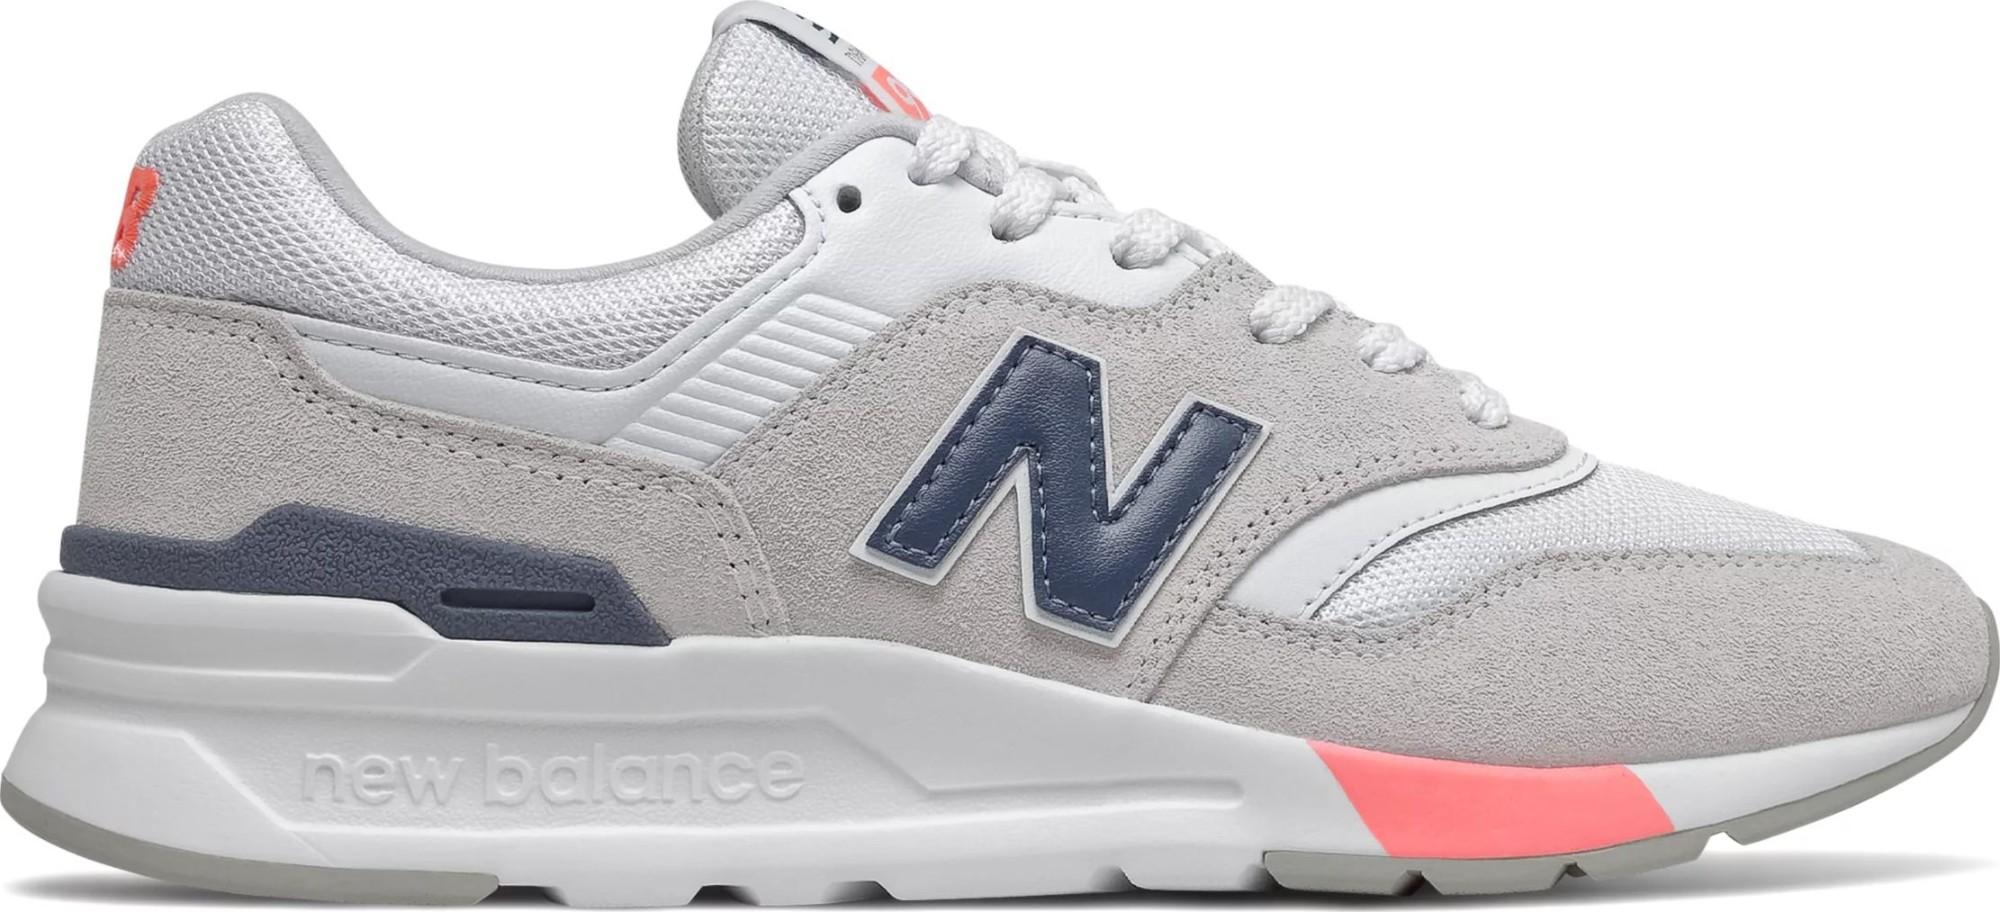 New Balance CW997 Grey HVP 39